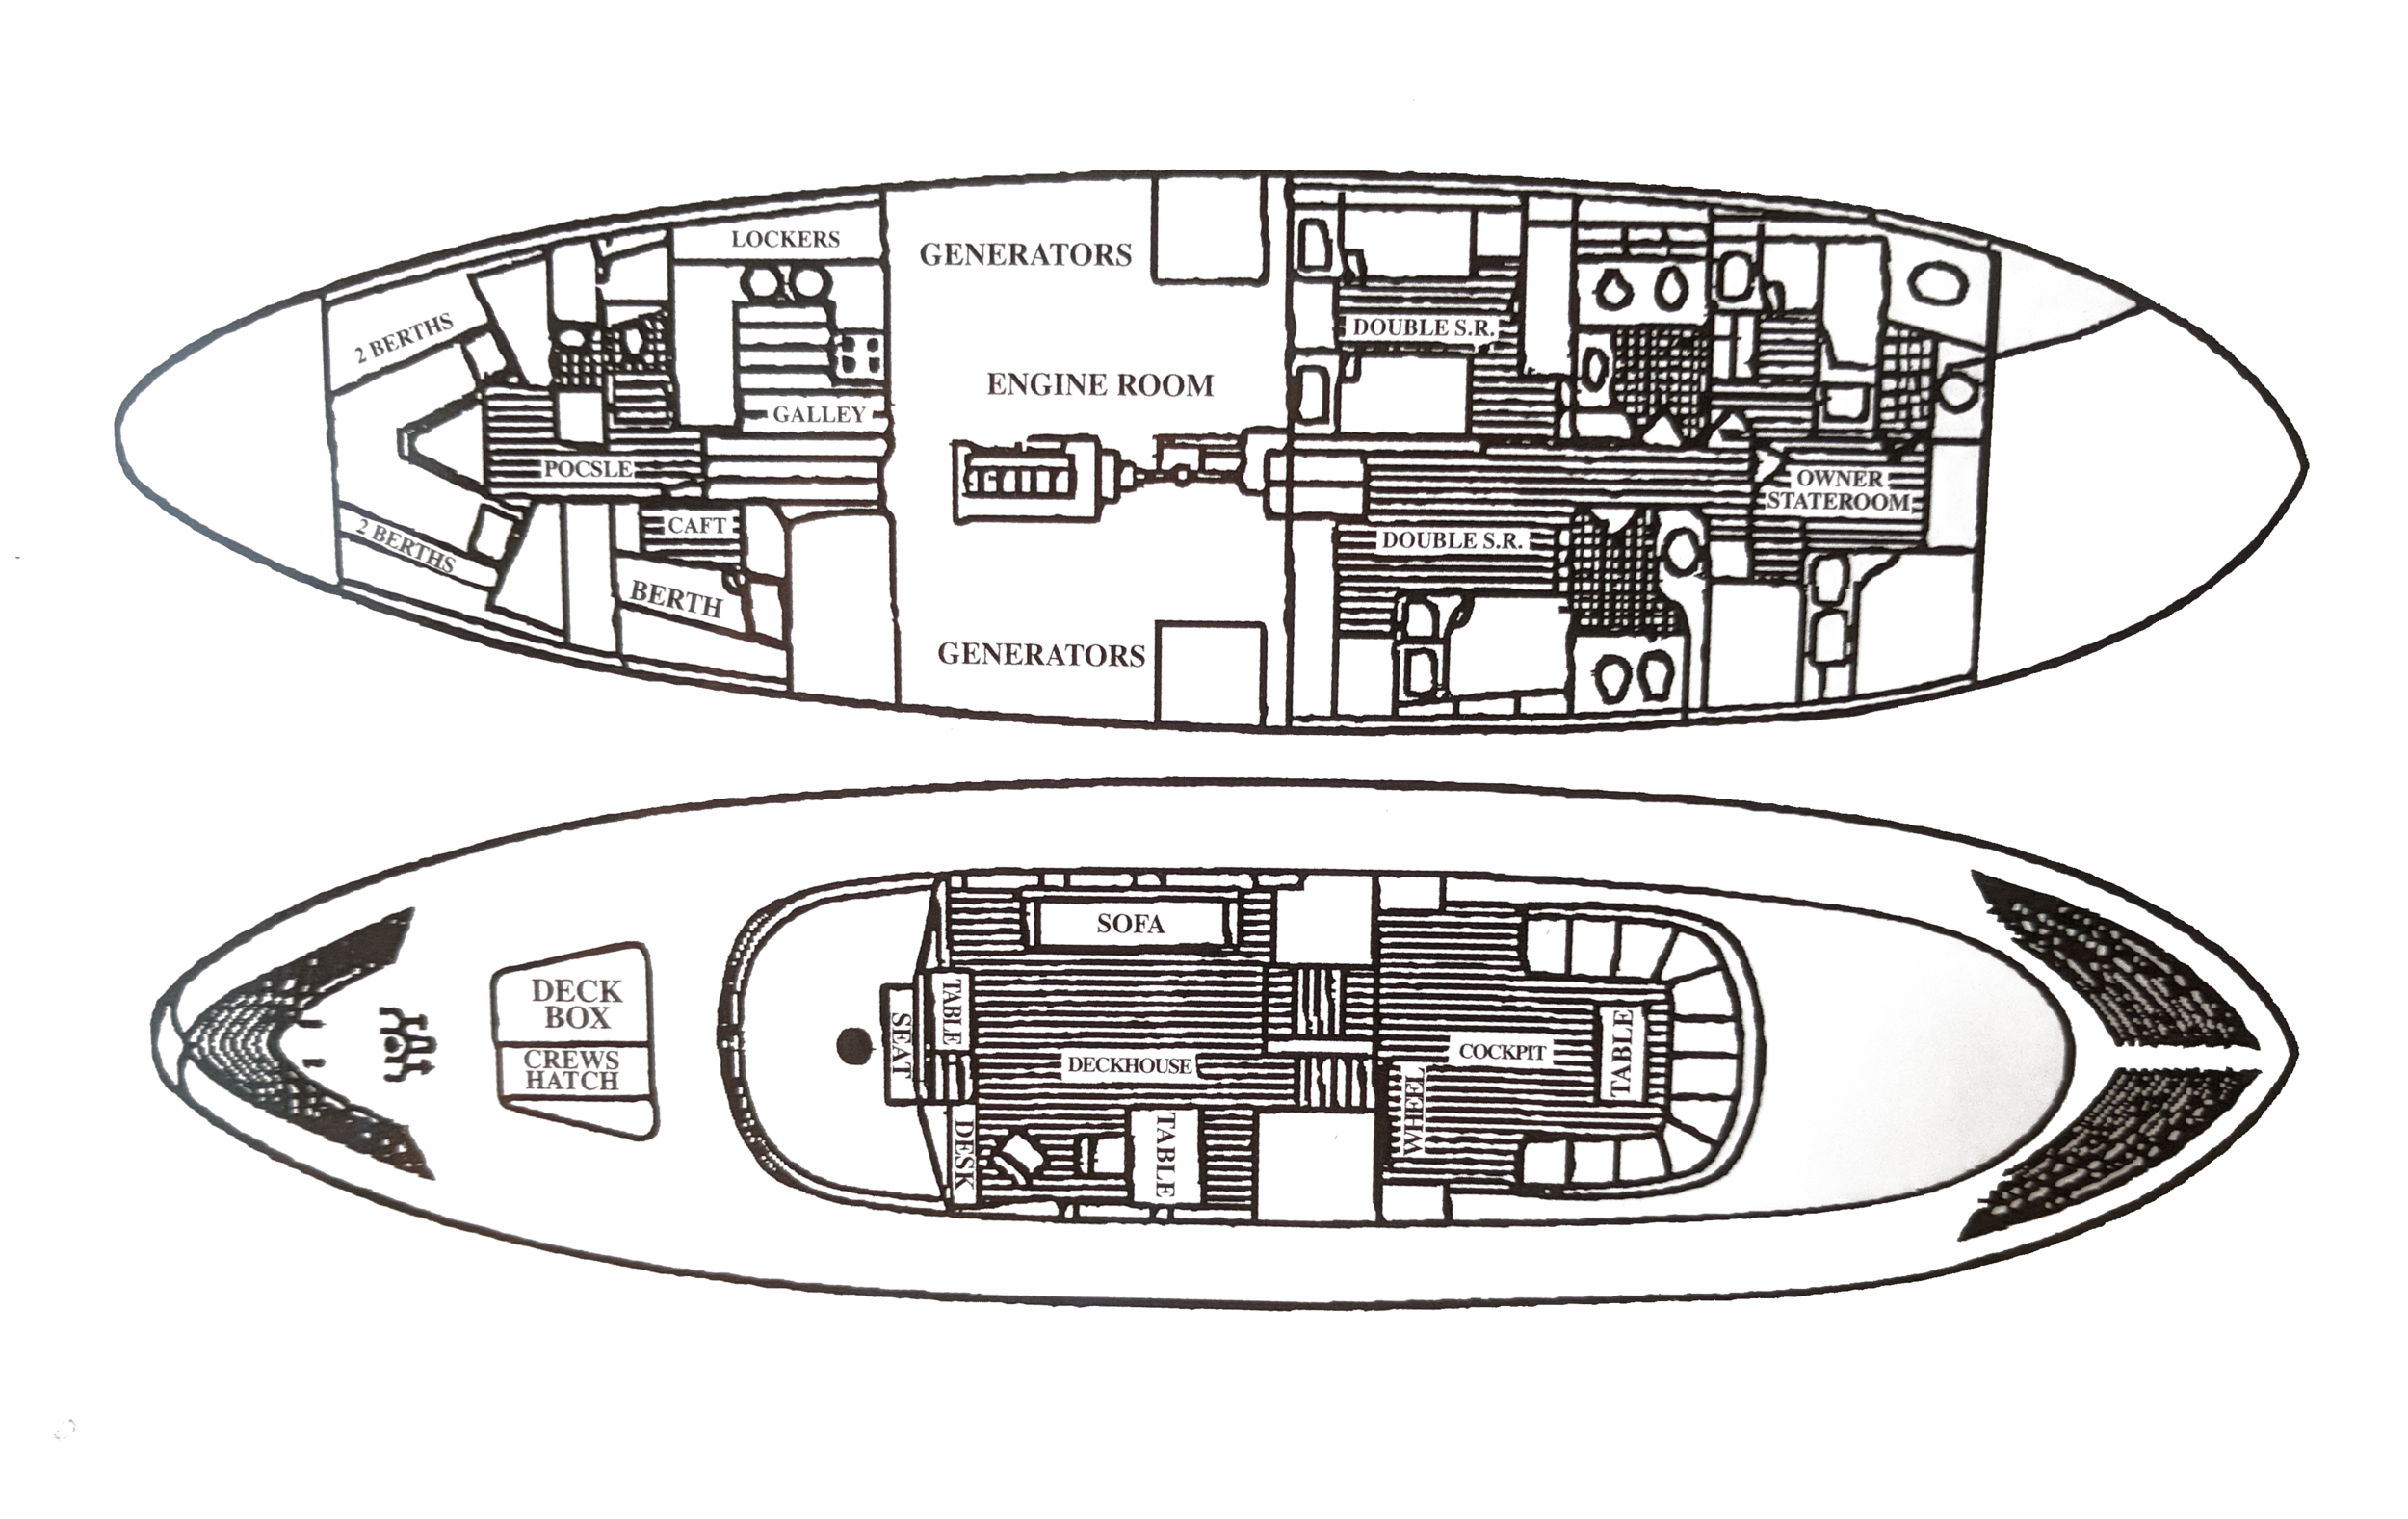 Seaprince floorplan.png